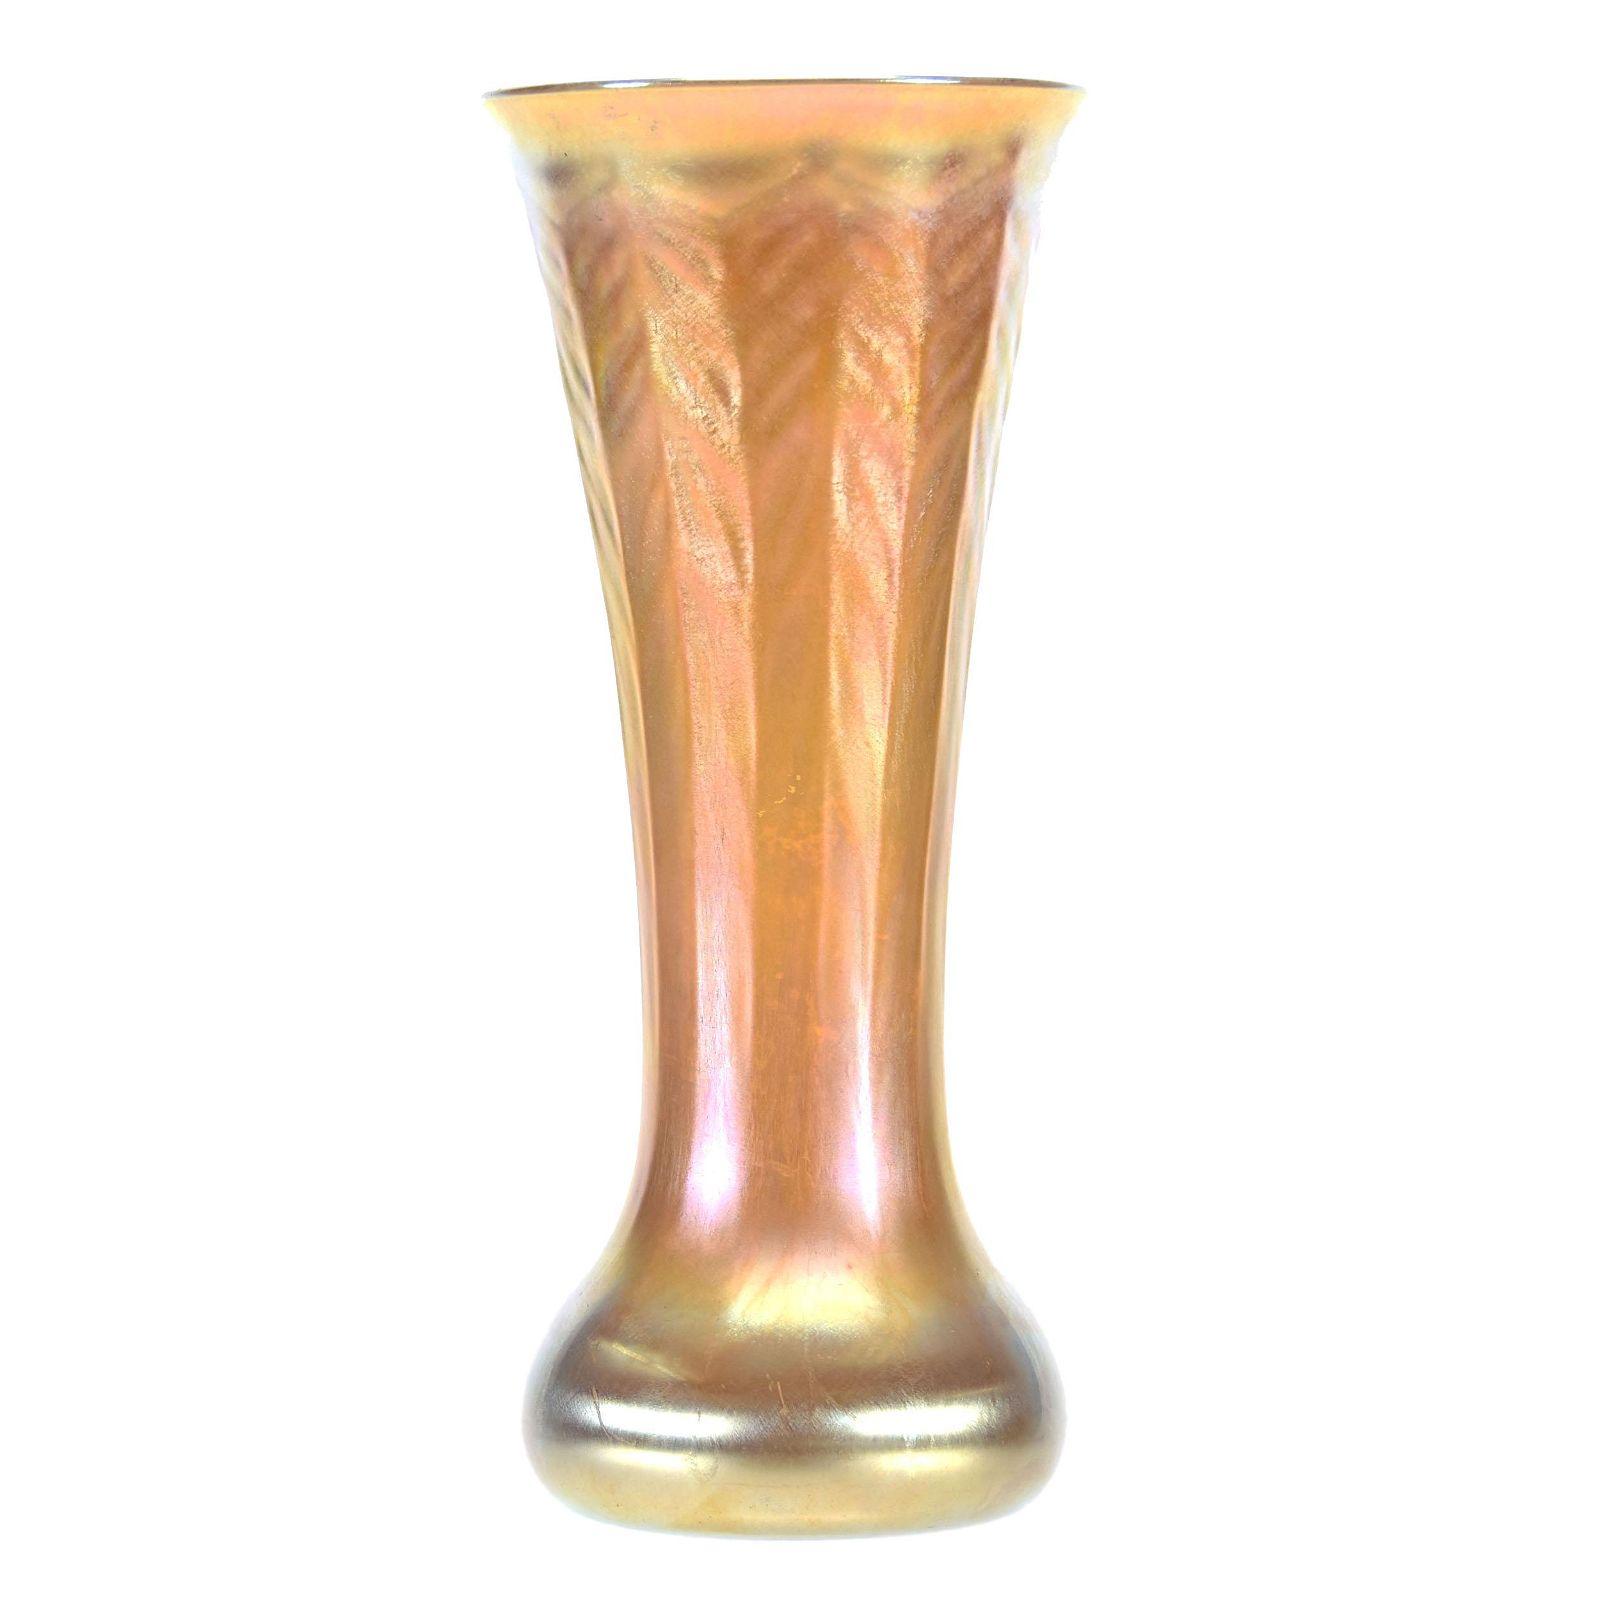 Signed L.C. Tiffany-Inc. Favrile, Art Glass Vase